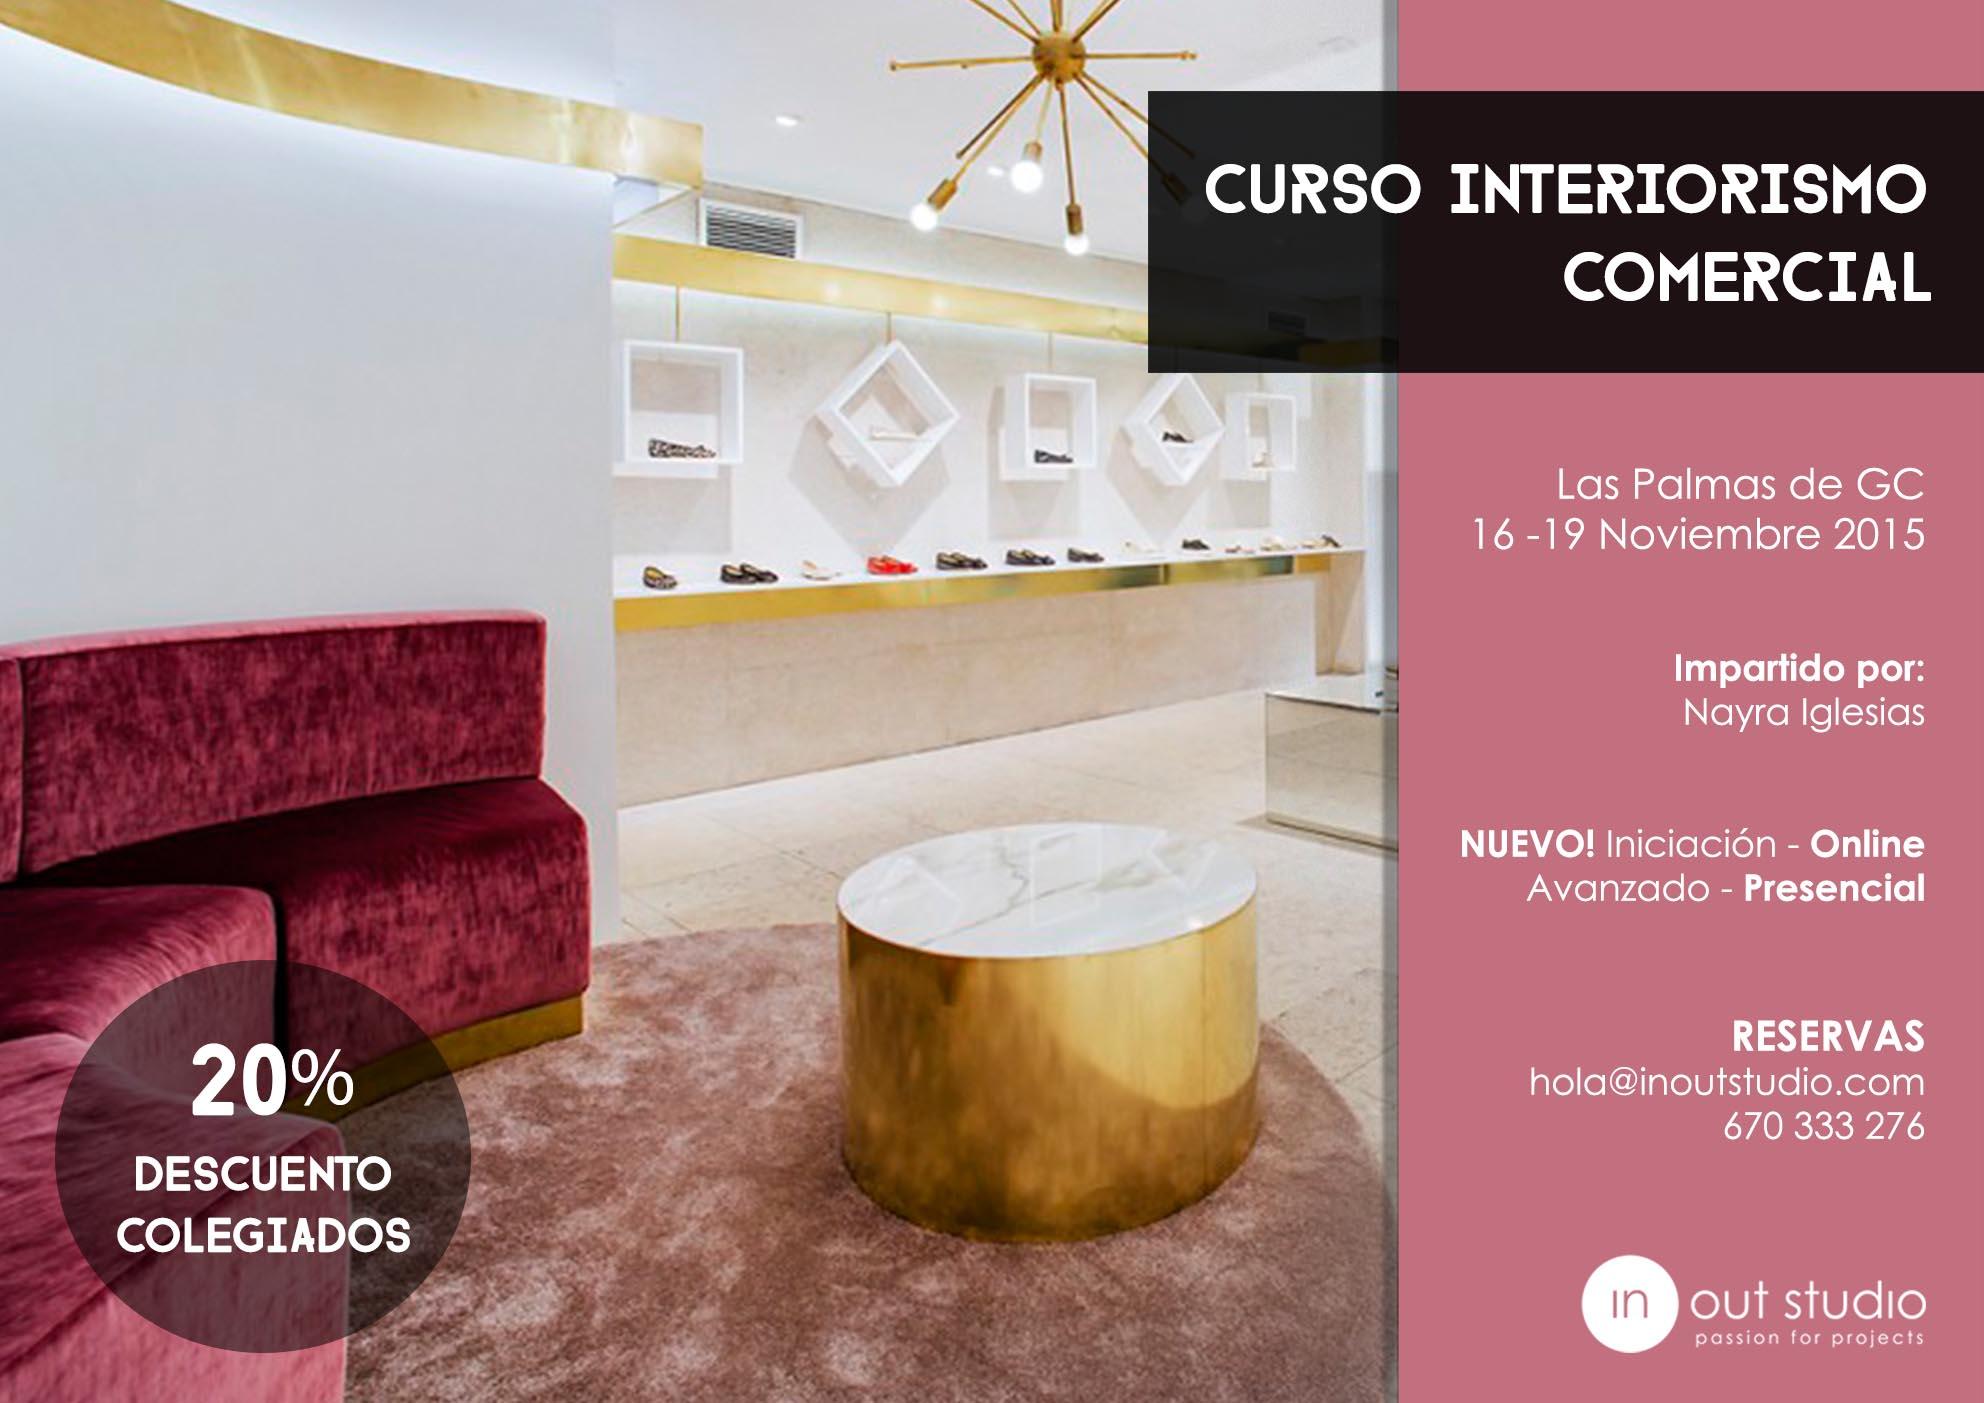 Curso de interiorismo dise os arquitect nicos for Curso interiorismo valencia